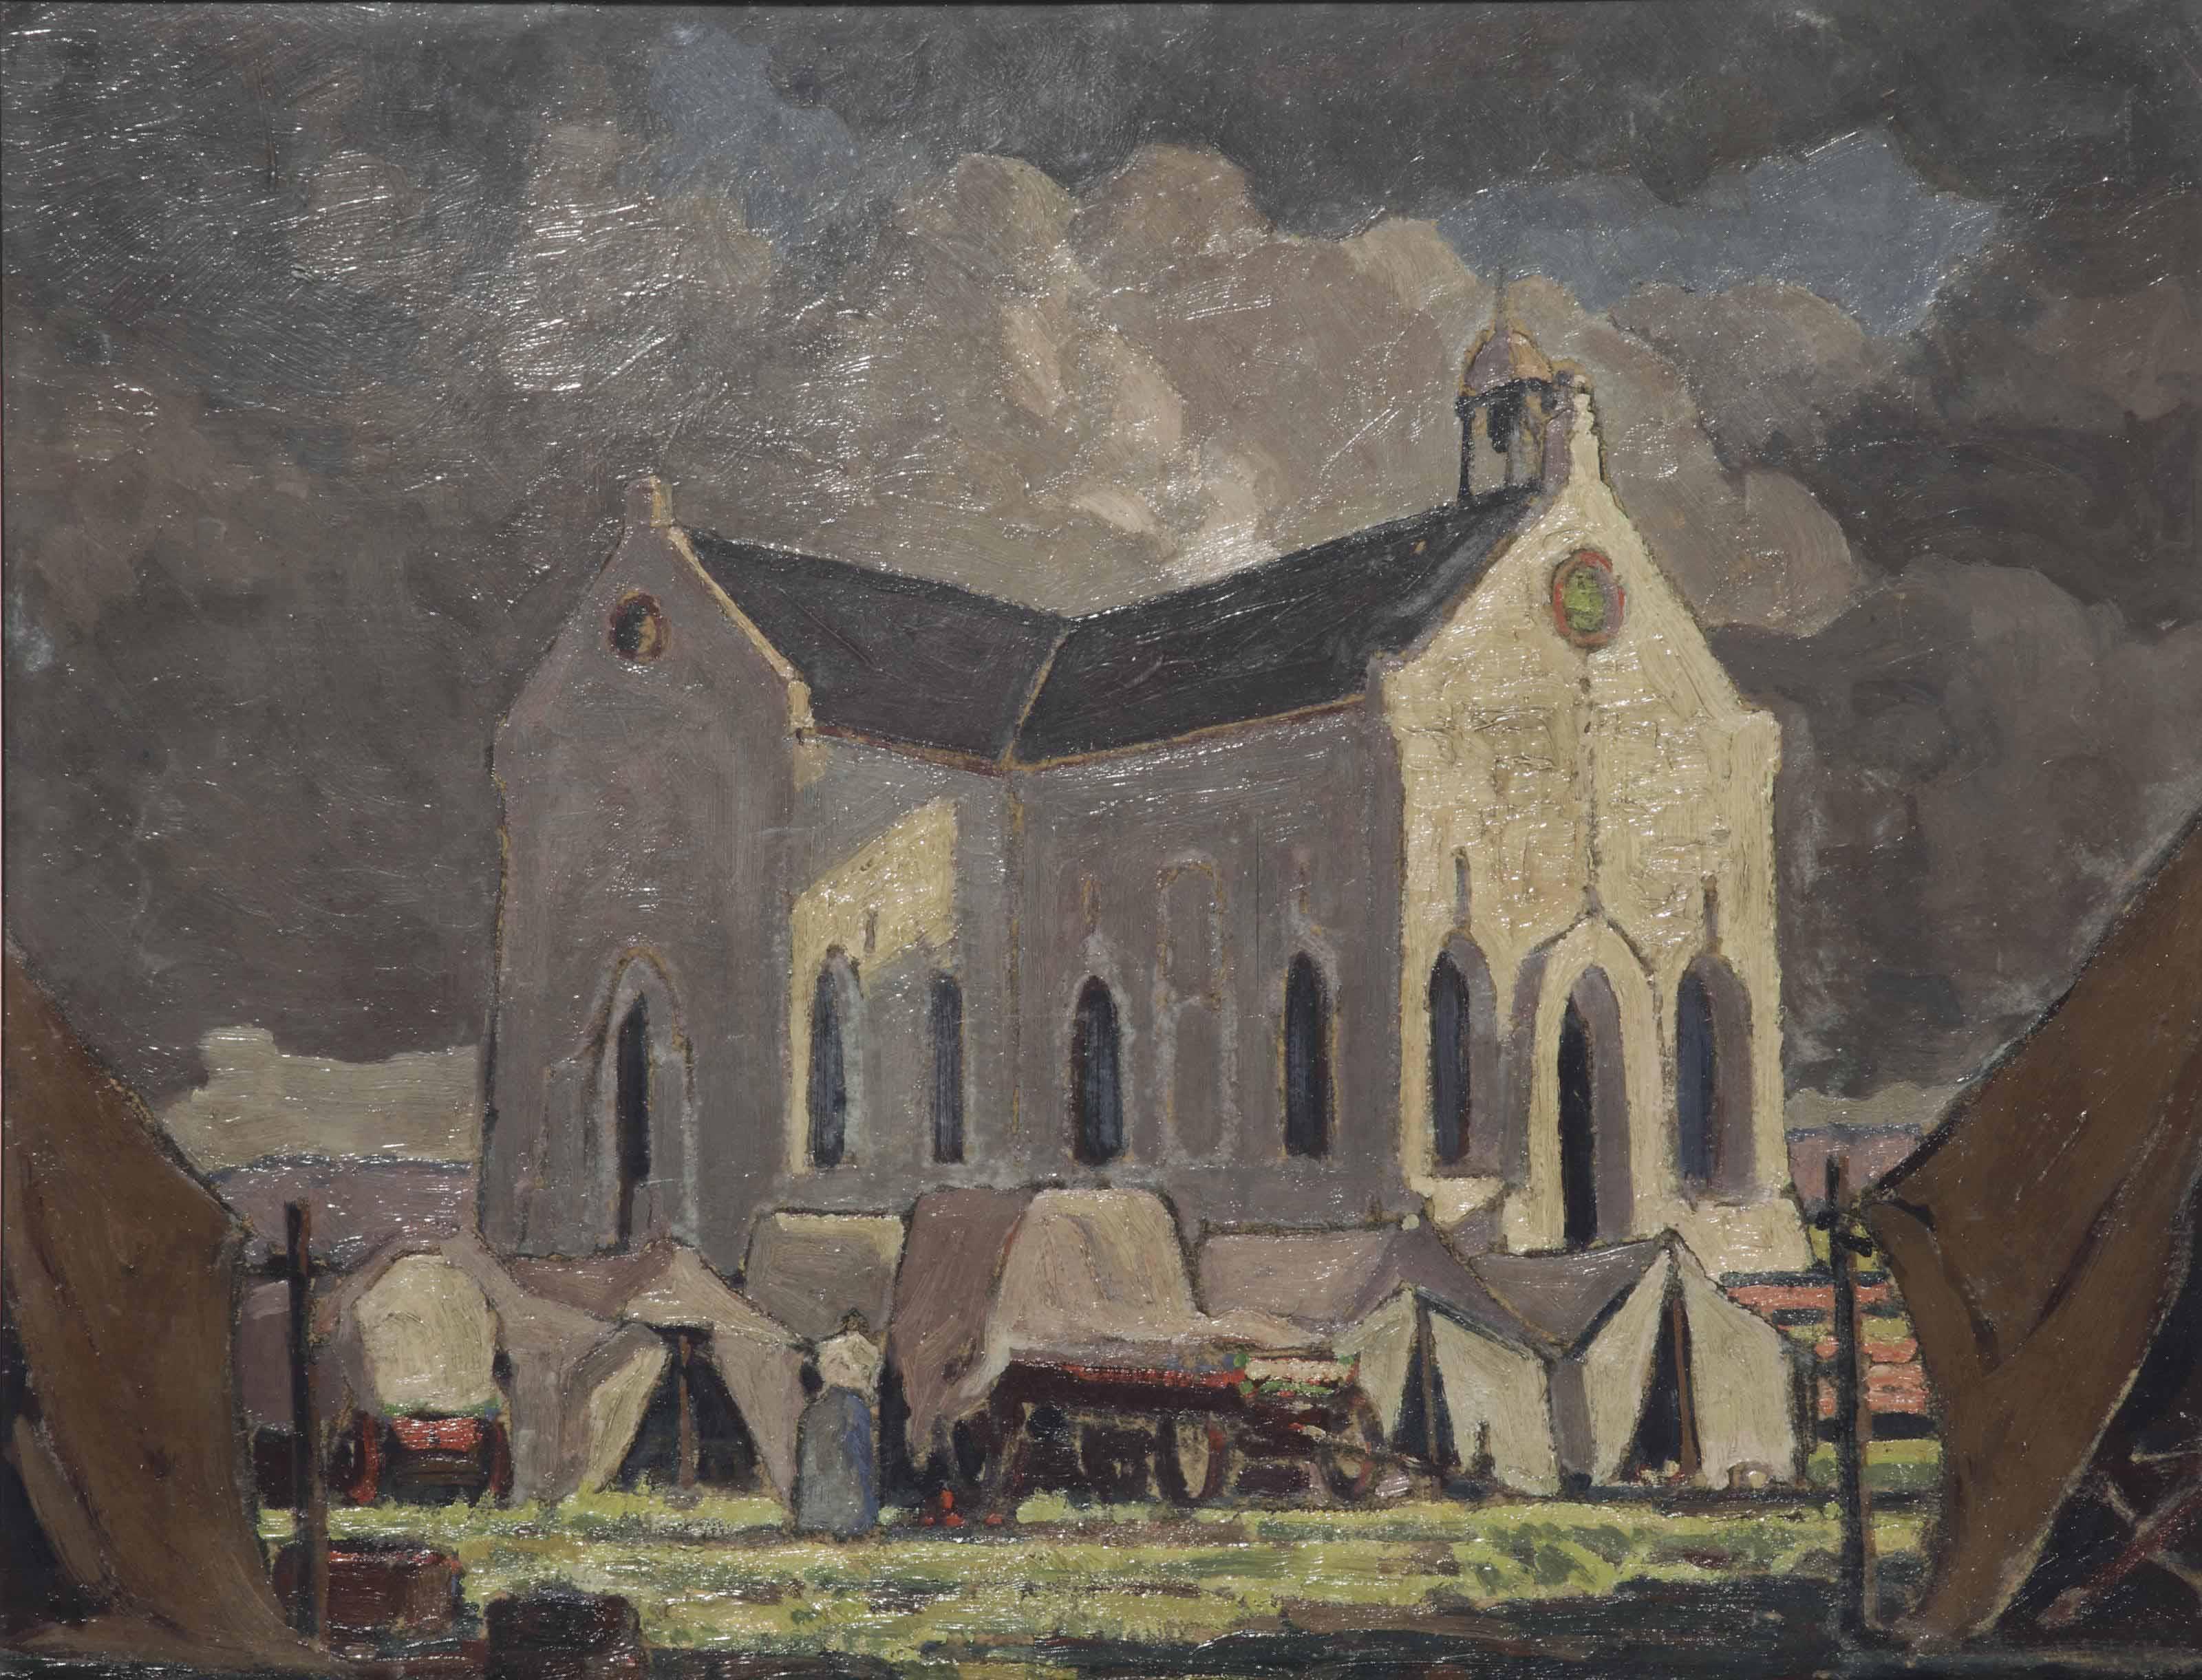 De gereformeerde kerk, Zuid Afrika